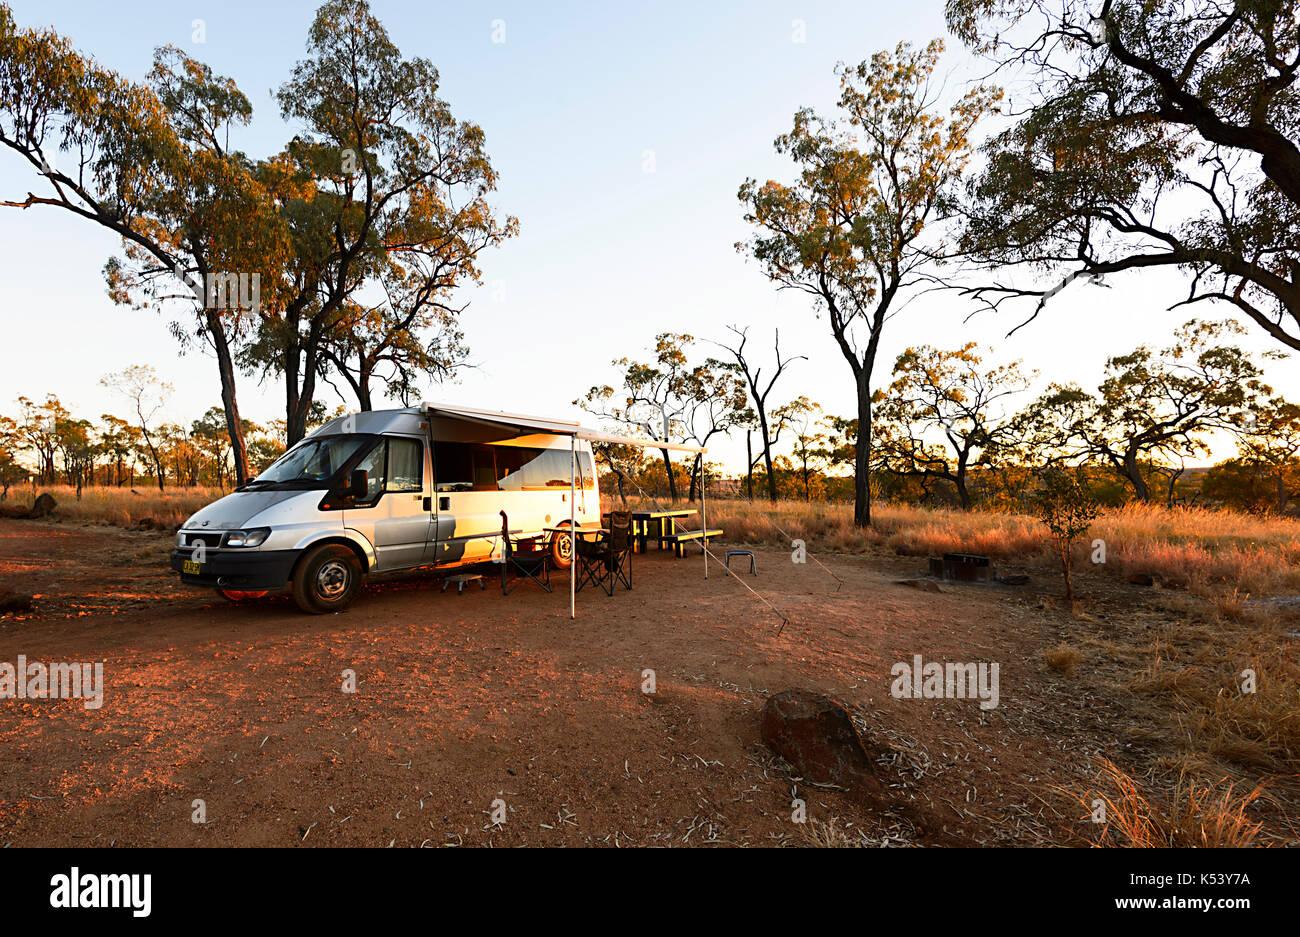 Ford Transit autocaravana bush camping en Porcupine Gorge National Park, Queensland, Queensland, Australia Imagen De Stock